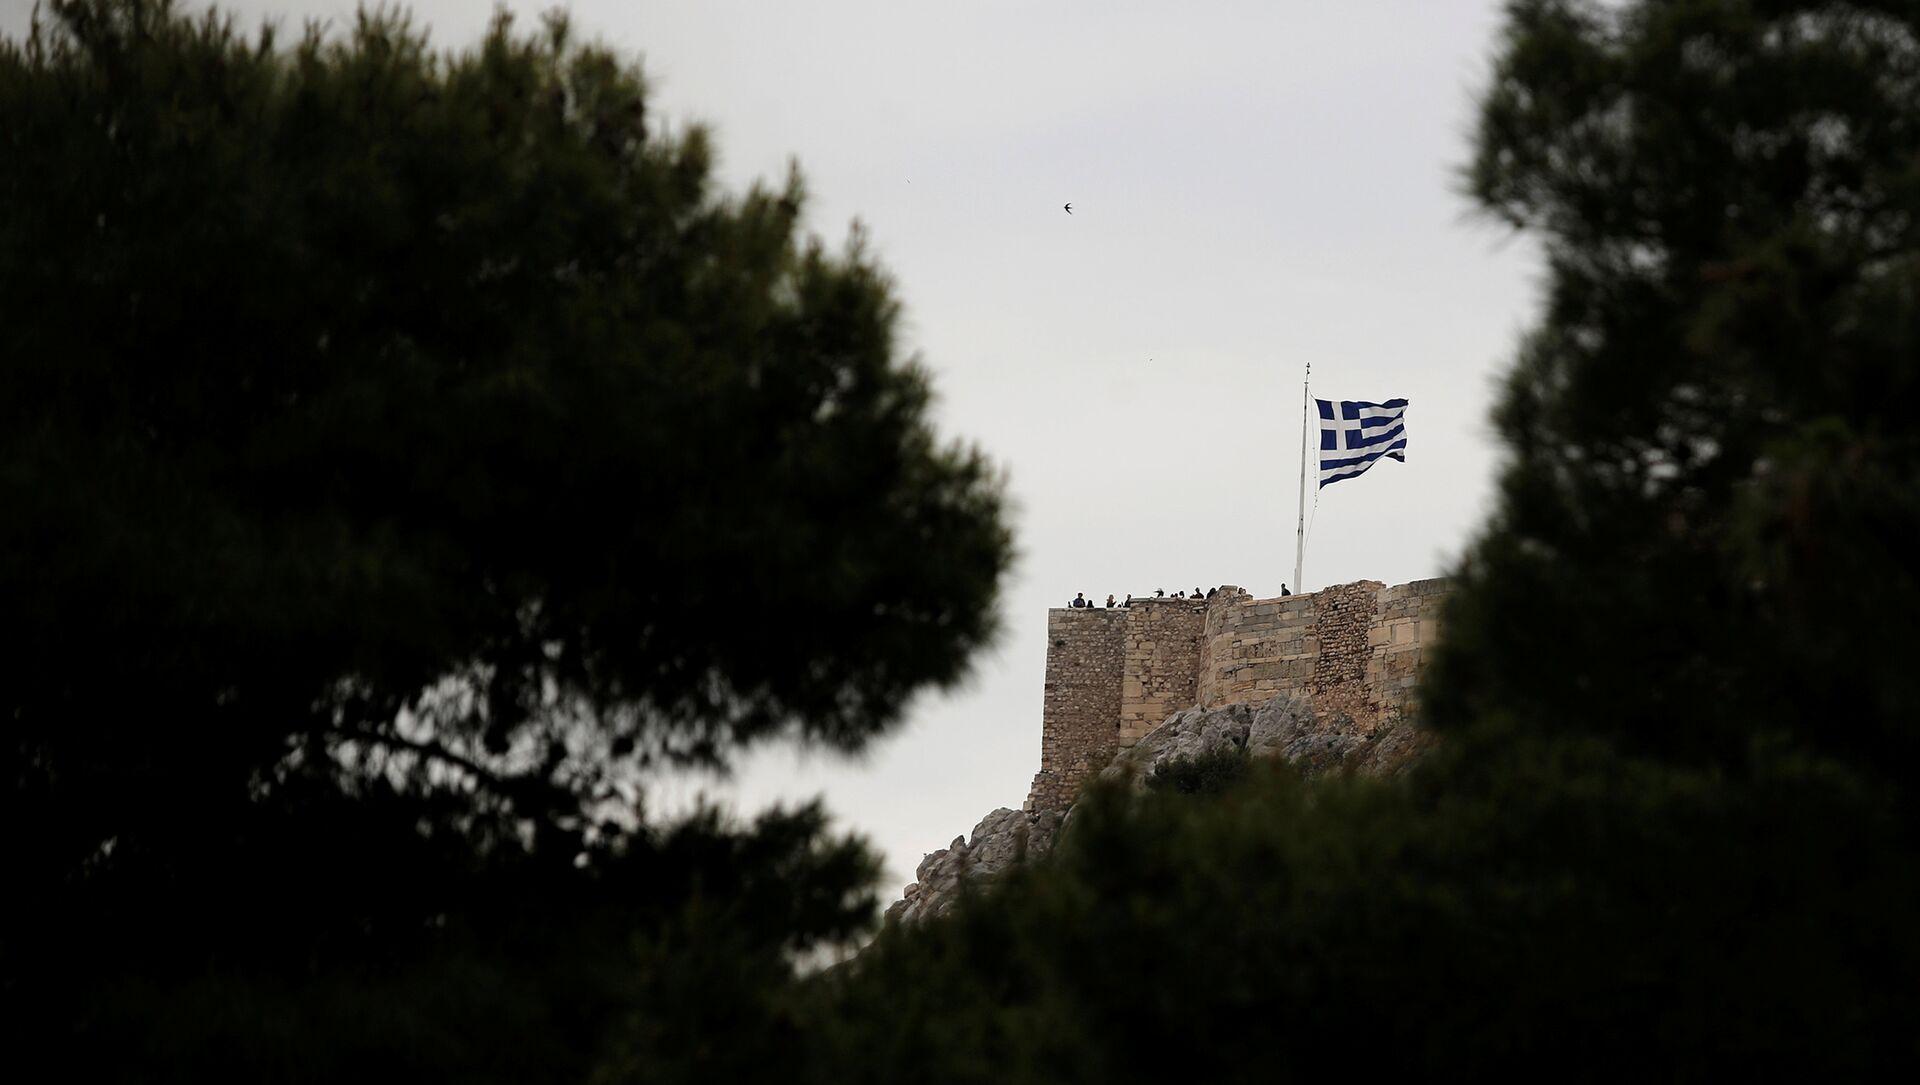 Yunanistan / Yunan bayrağı - Sputnik Türkiye, 1920, 20.04.2021